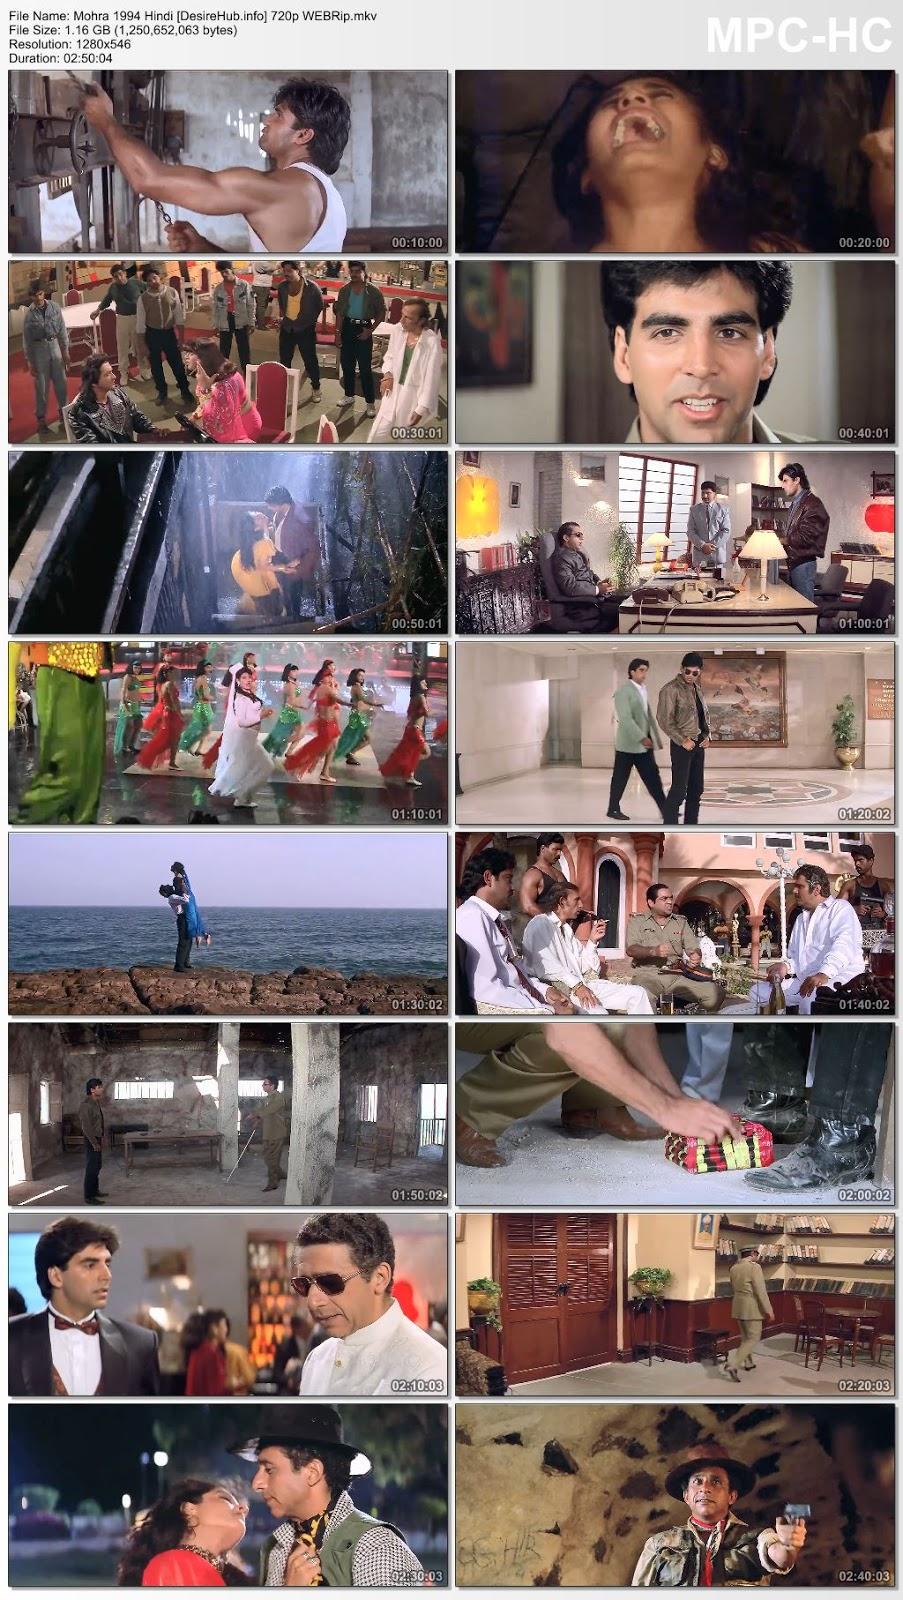 Mohra 1994 Hindi 720p WEBRip 1.1GB Desirehub